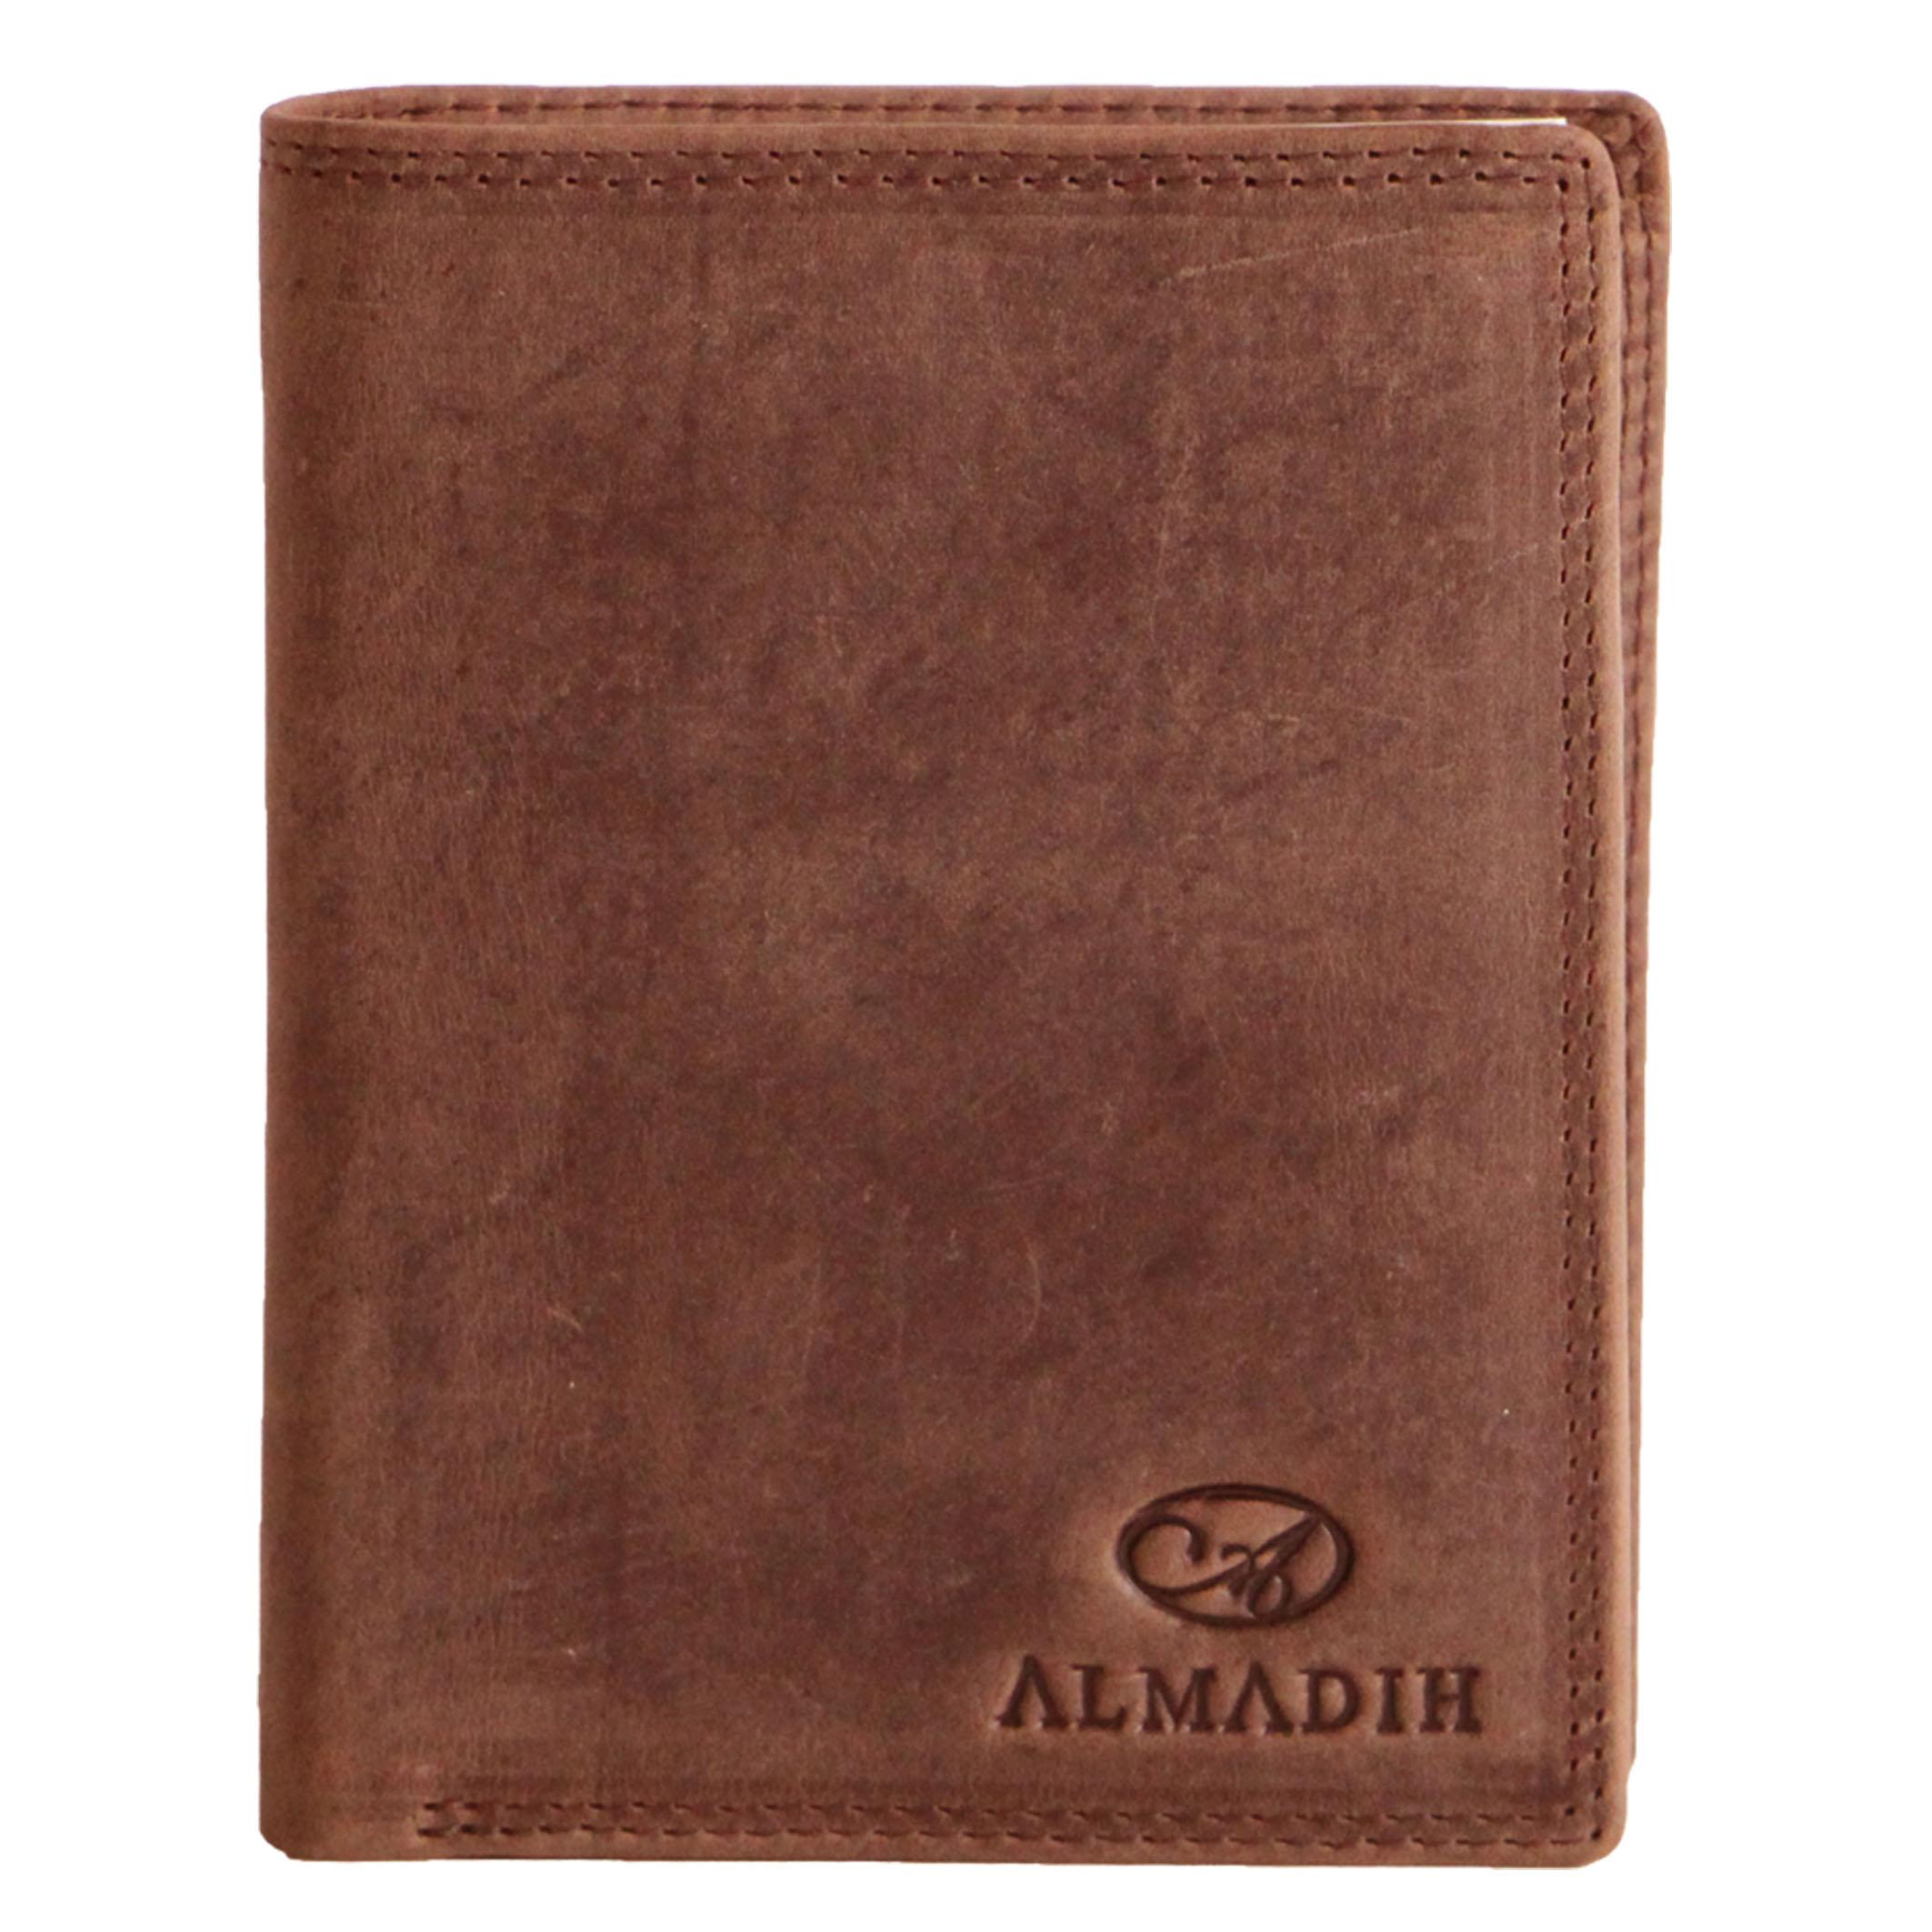 P2H ALMADIH Leder Portemonnaie Braun Vintage